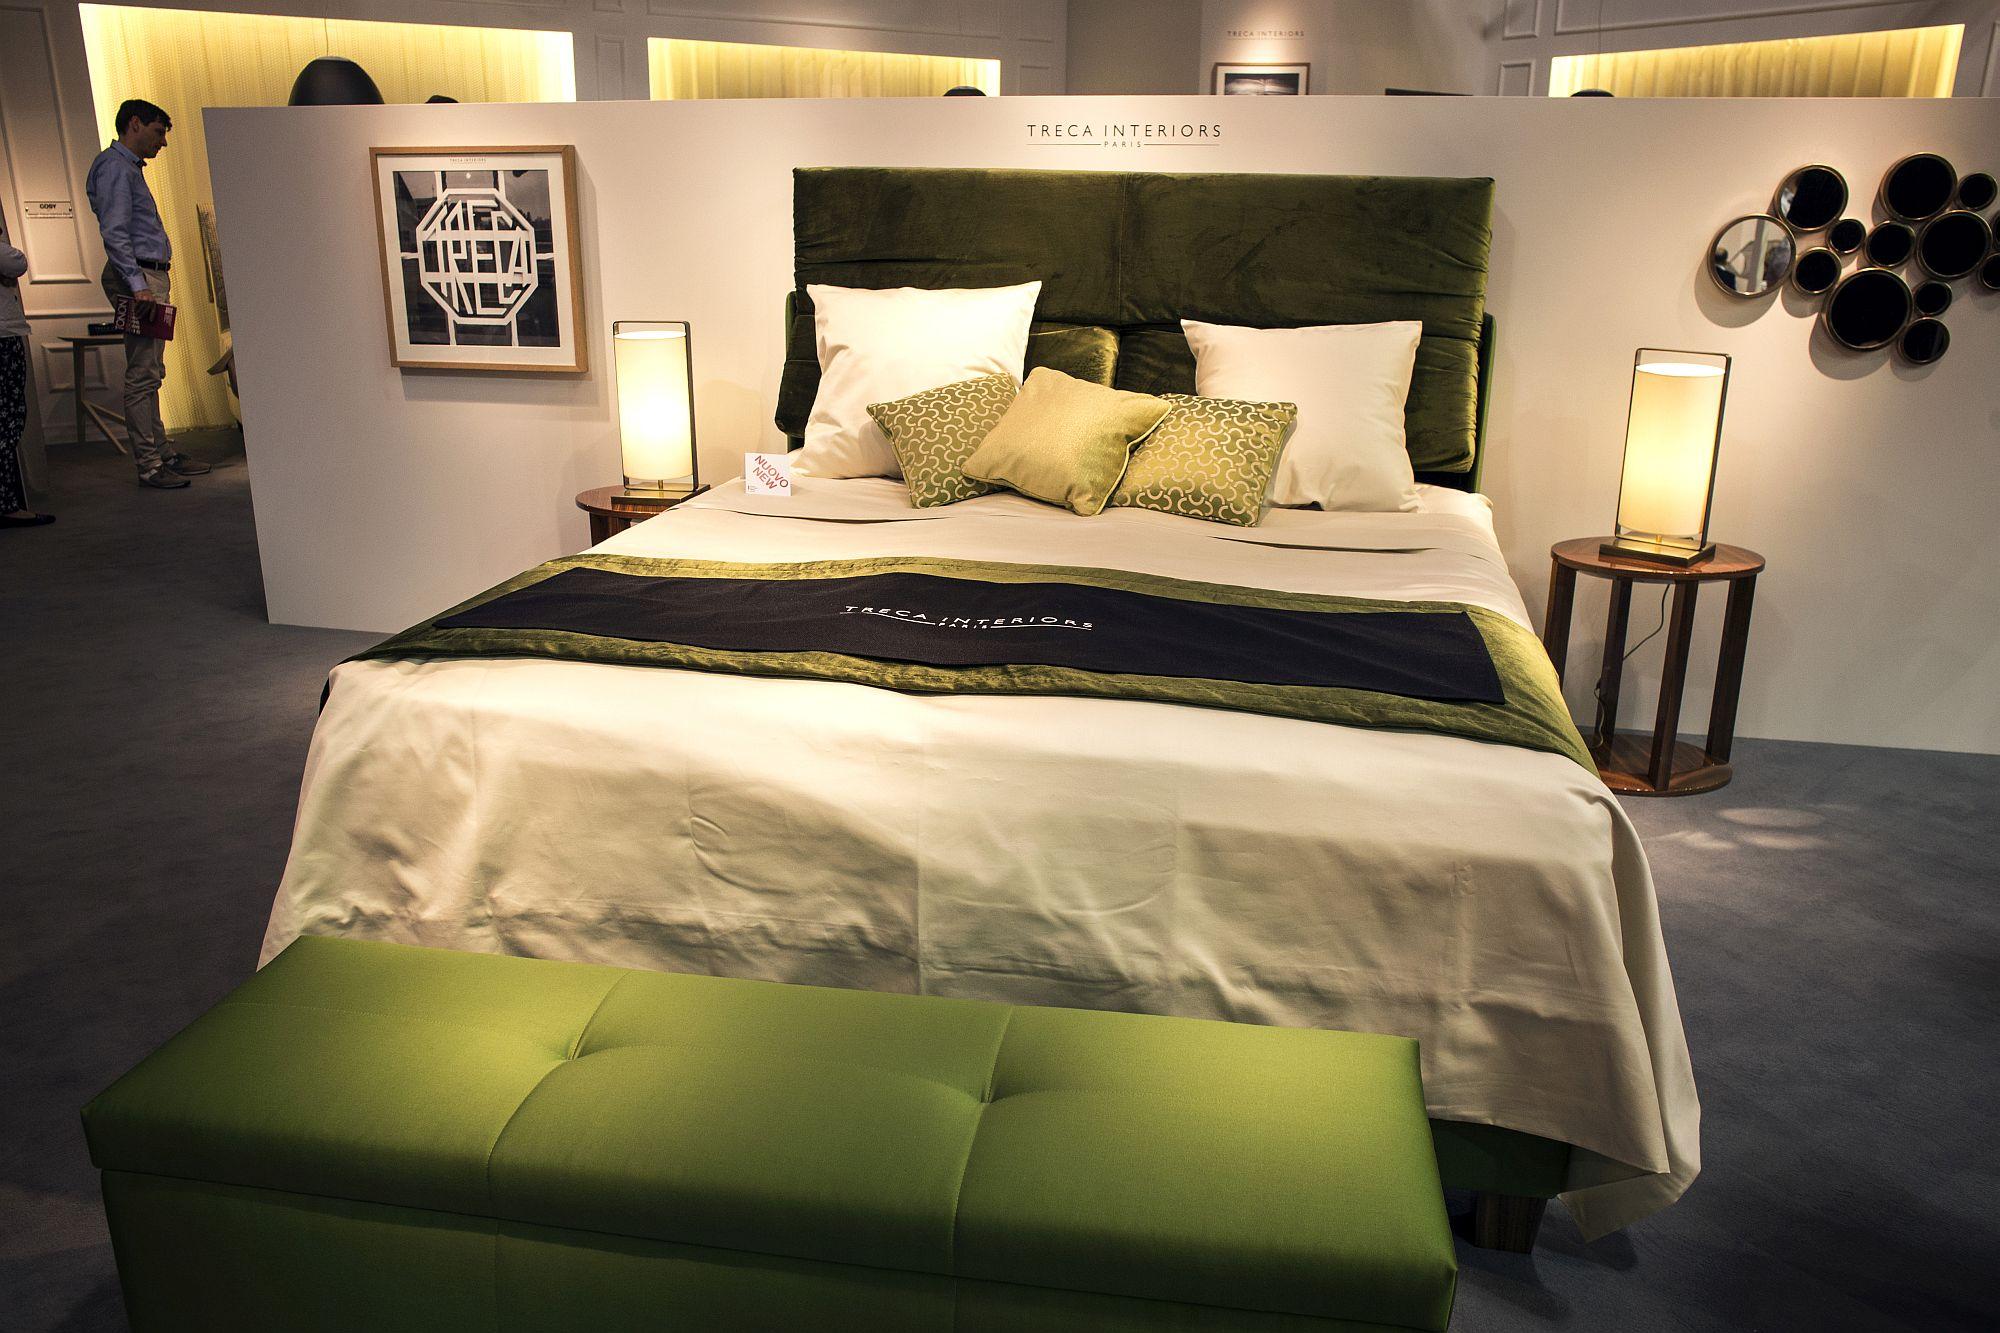 Delightful Upgrades: 25 Creative Bedside Lighting Ideas